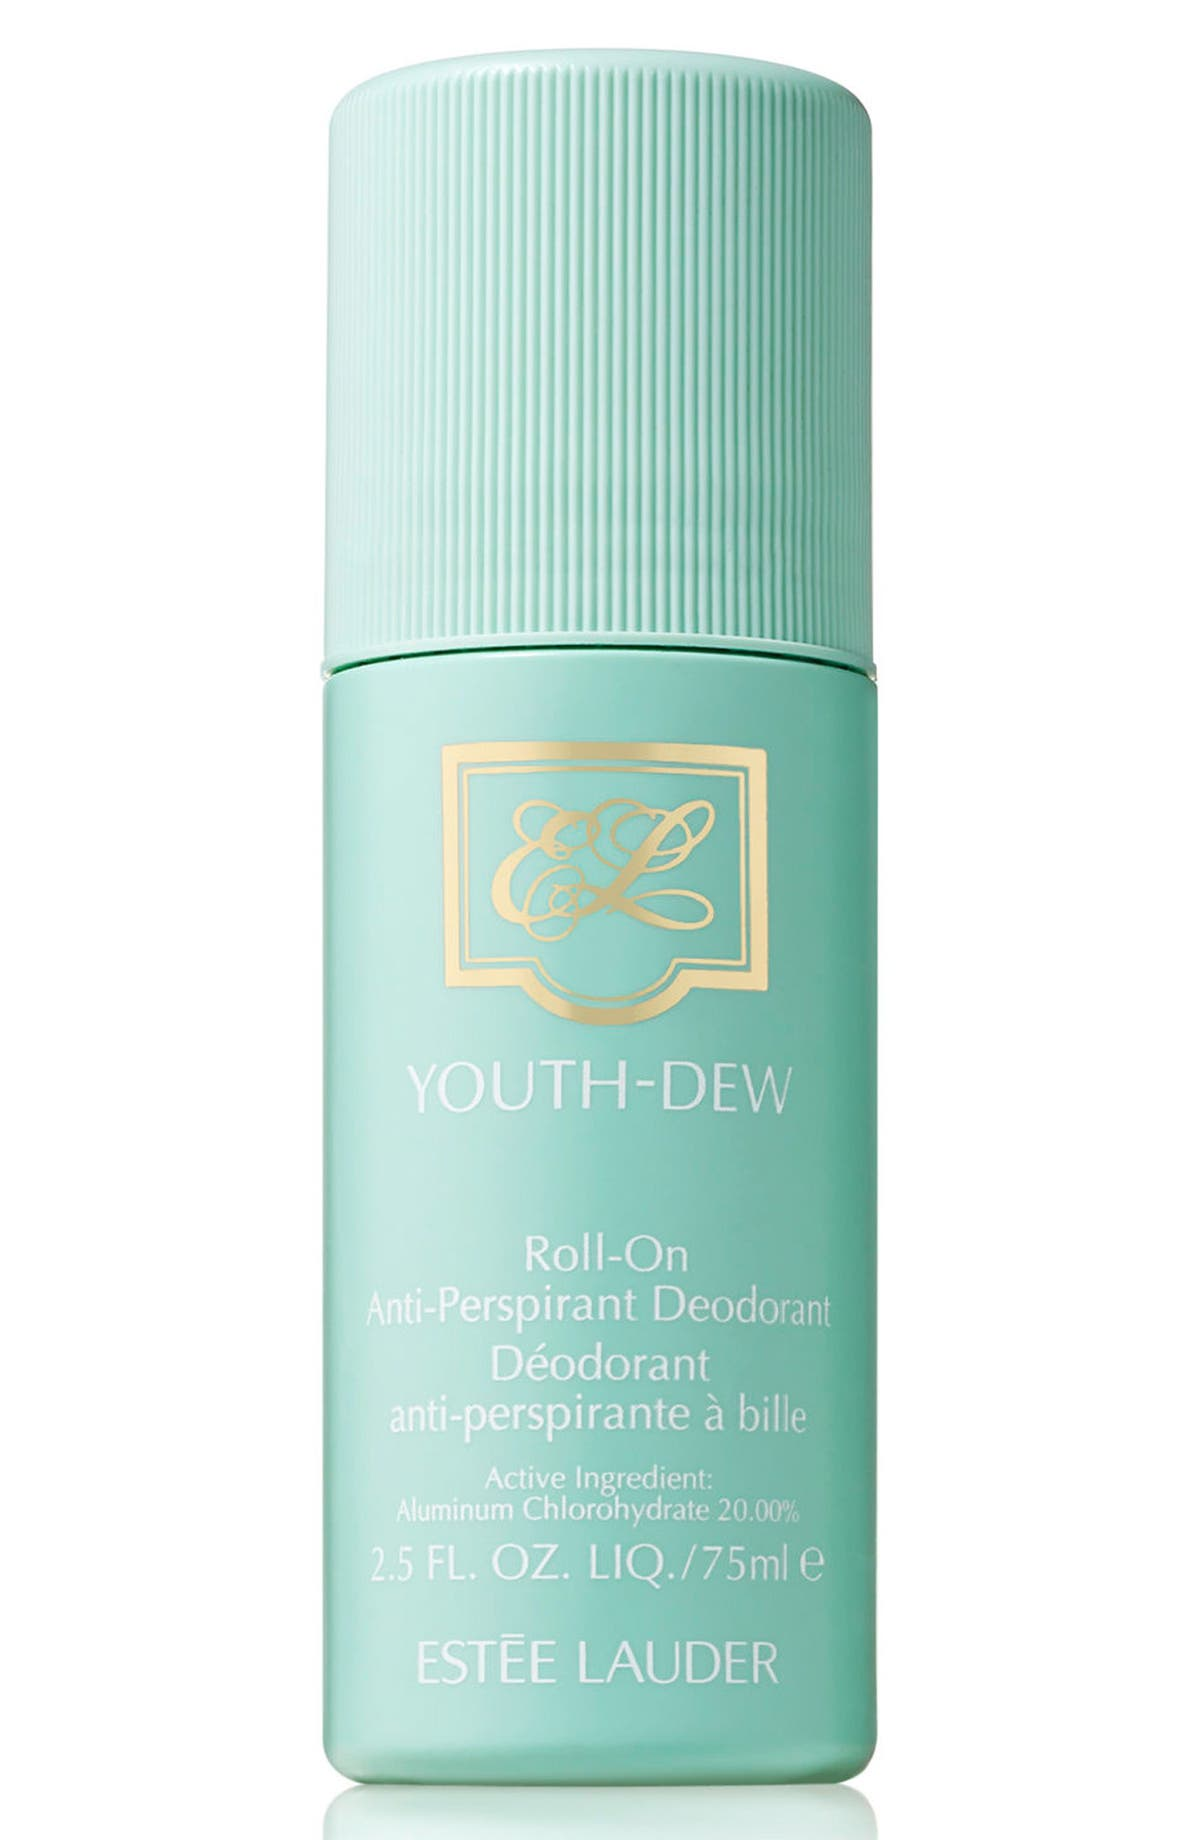 Este Lauder Youth Dew Roll On Antiperspirant Deodorant Nordstrom Estee Beautiful Women 75ml